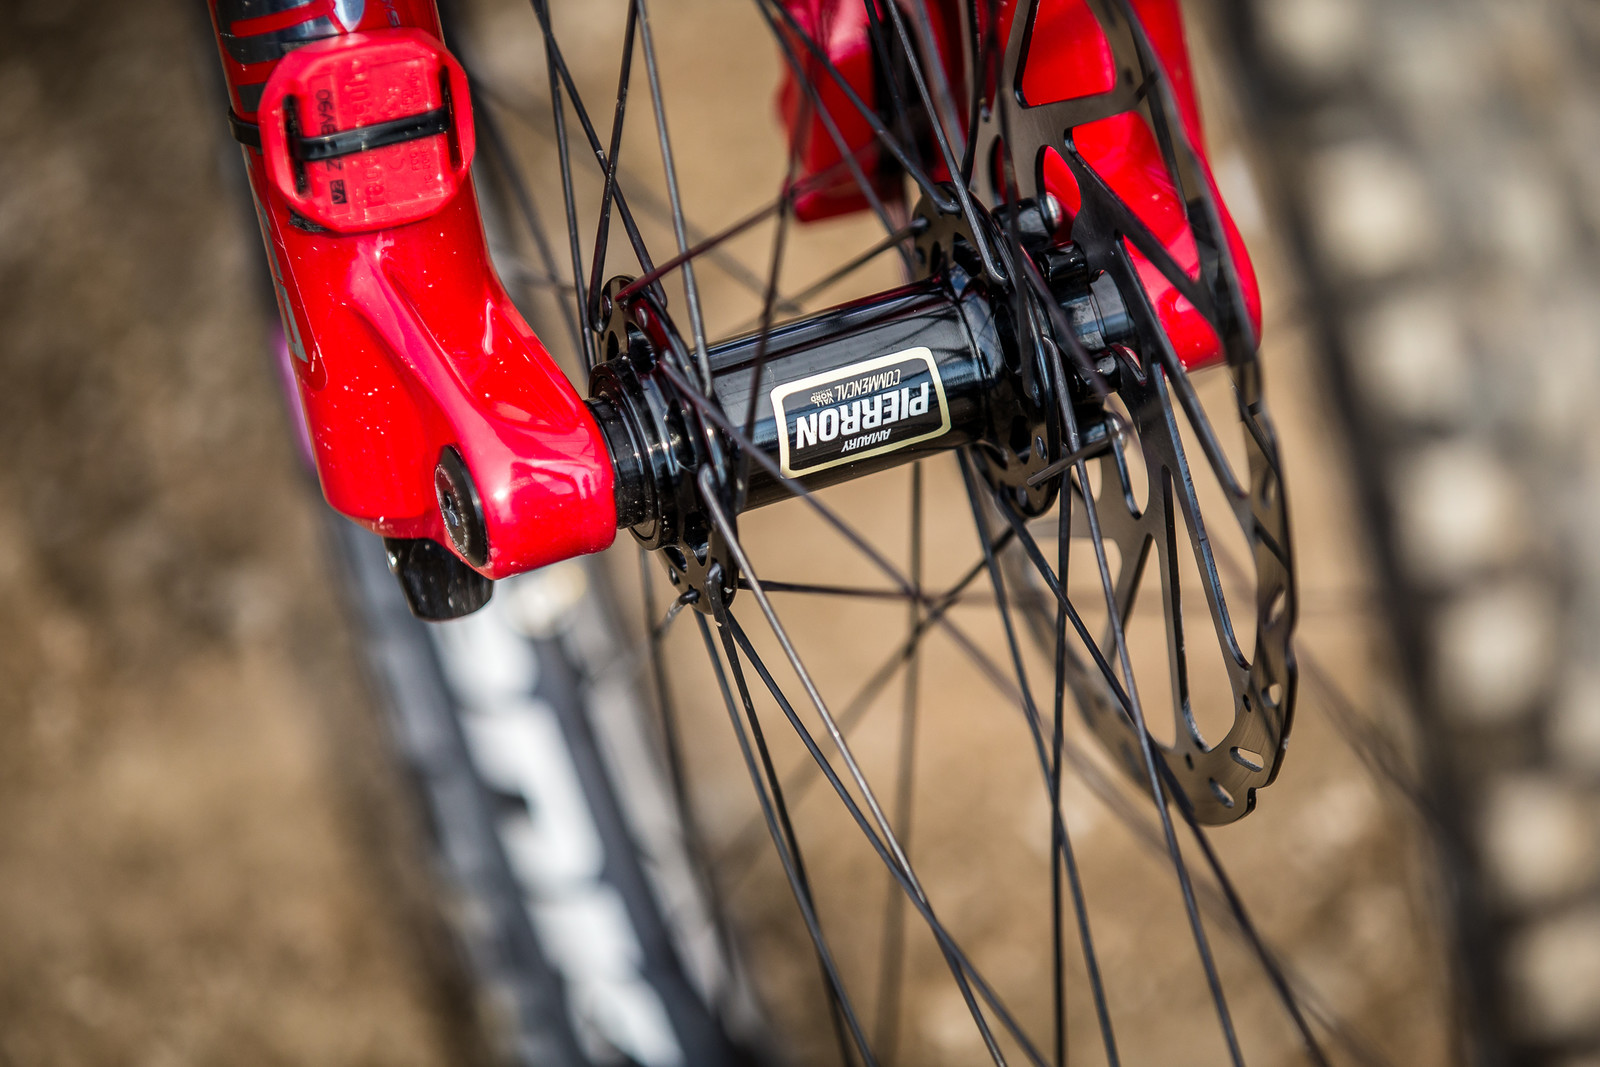 Bling Everywhere - WINNING BIKE - Amaury Pierron's Commencal Supreme DH 29 - Mountain Biking Pictures - Vital MTB